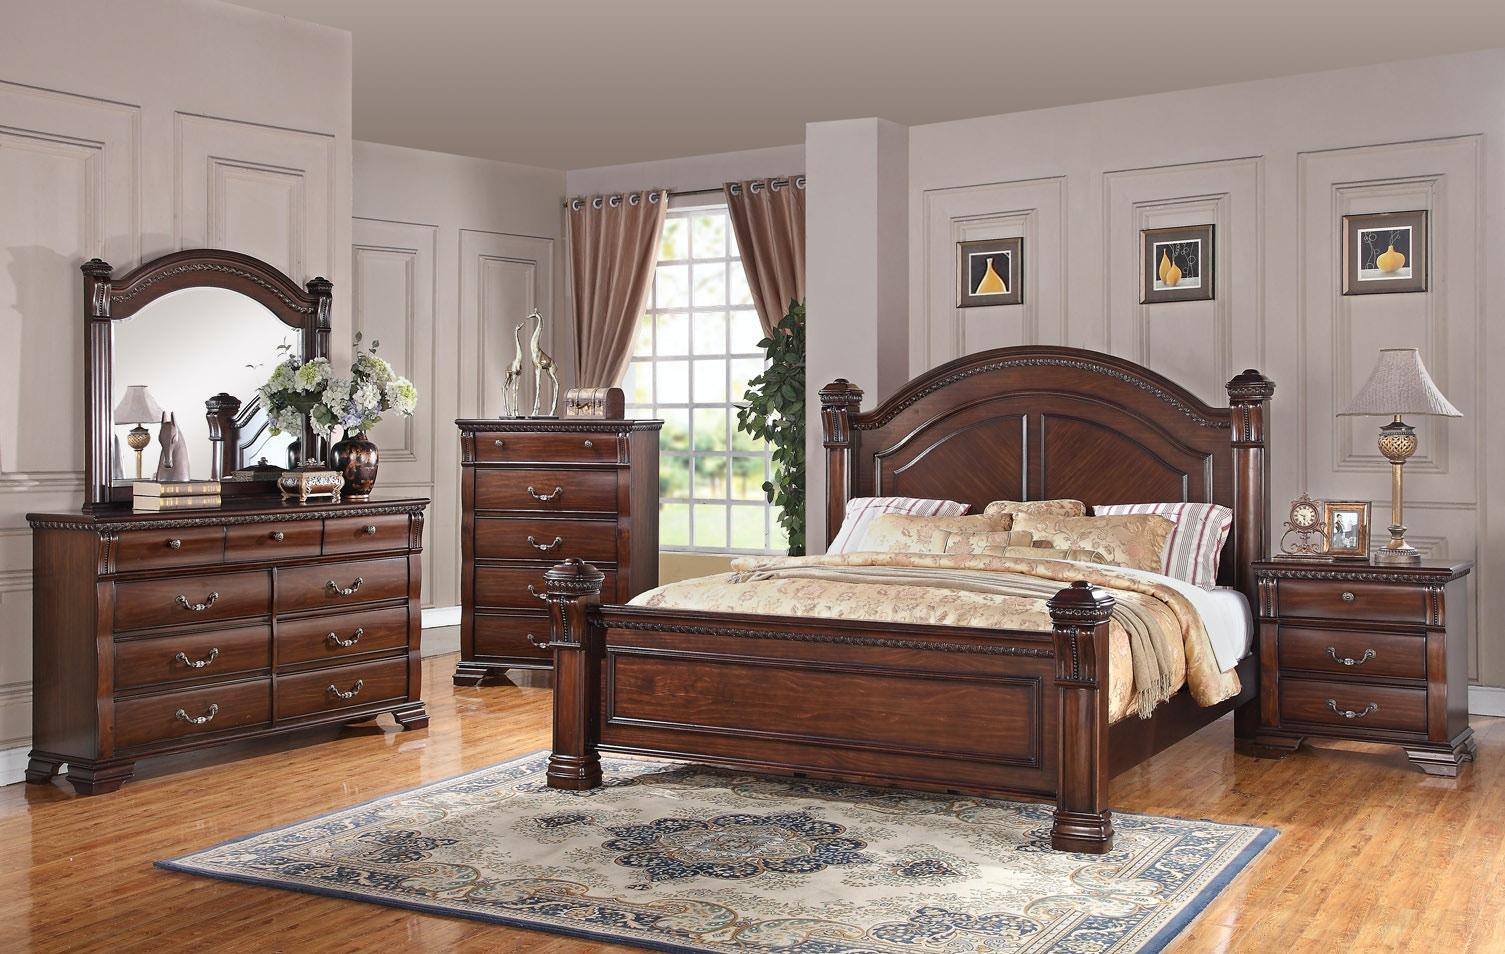 Austin Group Isabella Bedroom Group Queen 067786 Furniture Fair Cincinnati Dayton Oh And